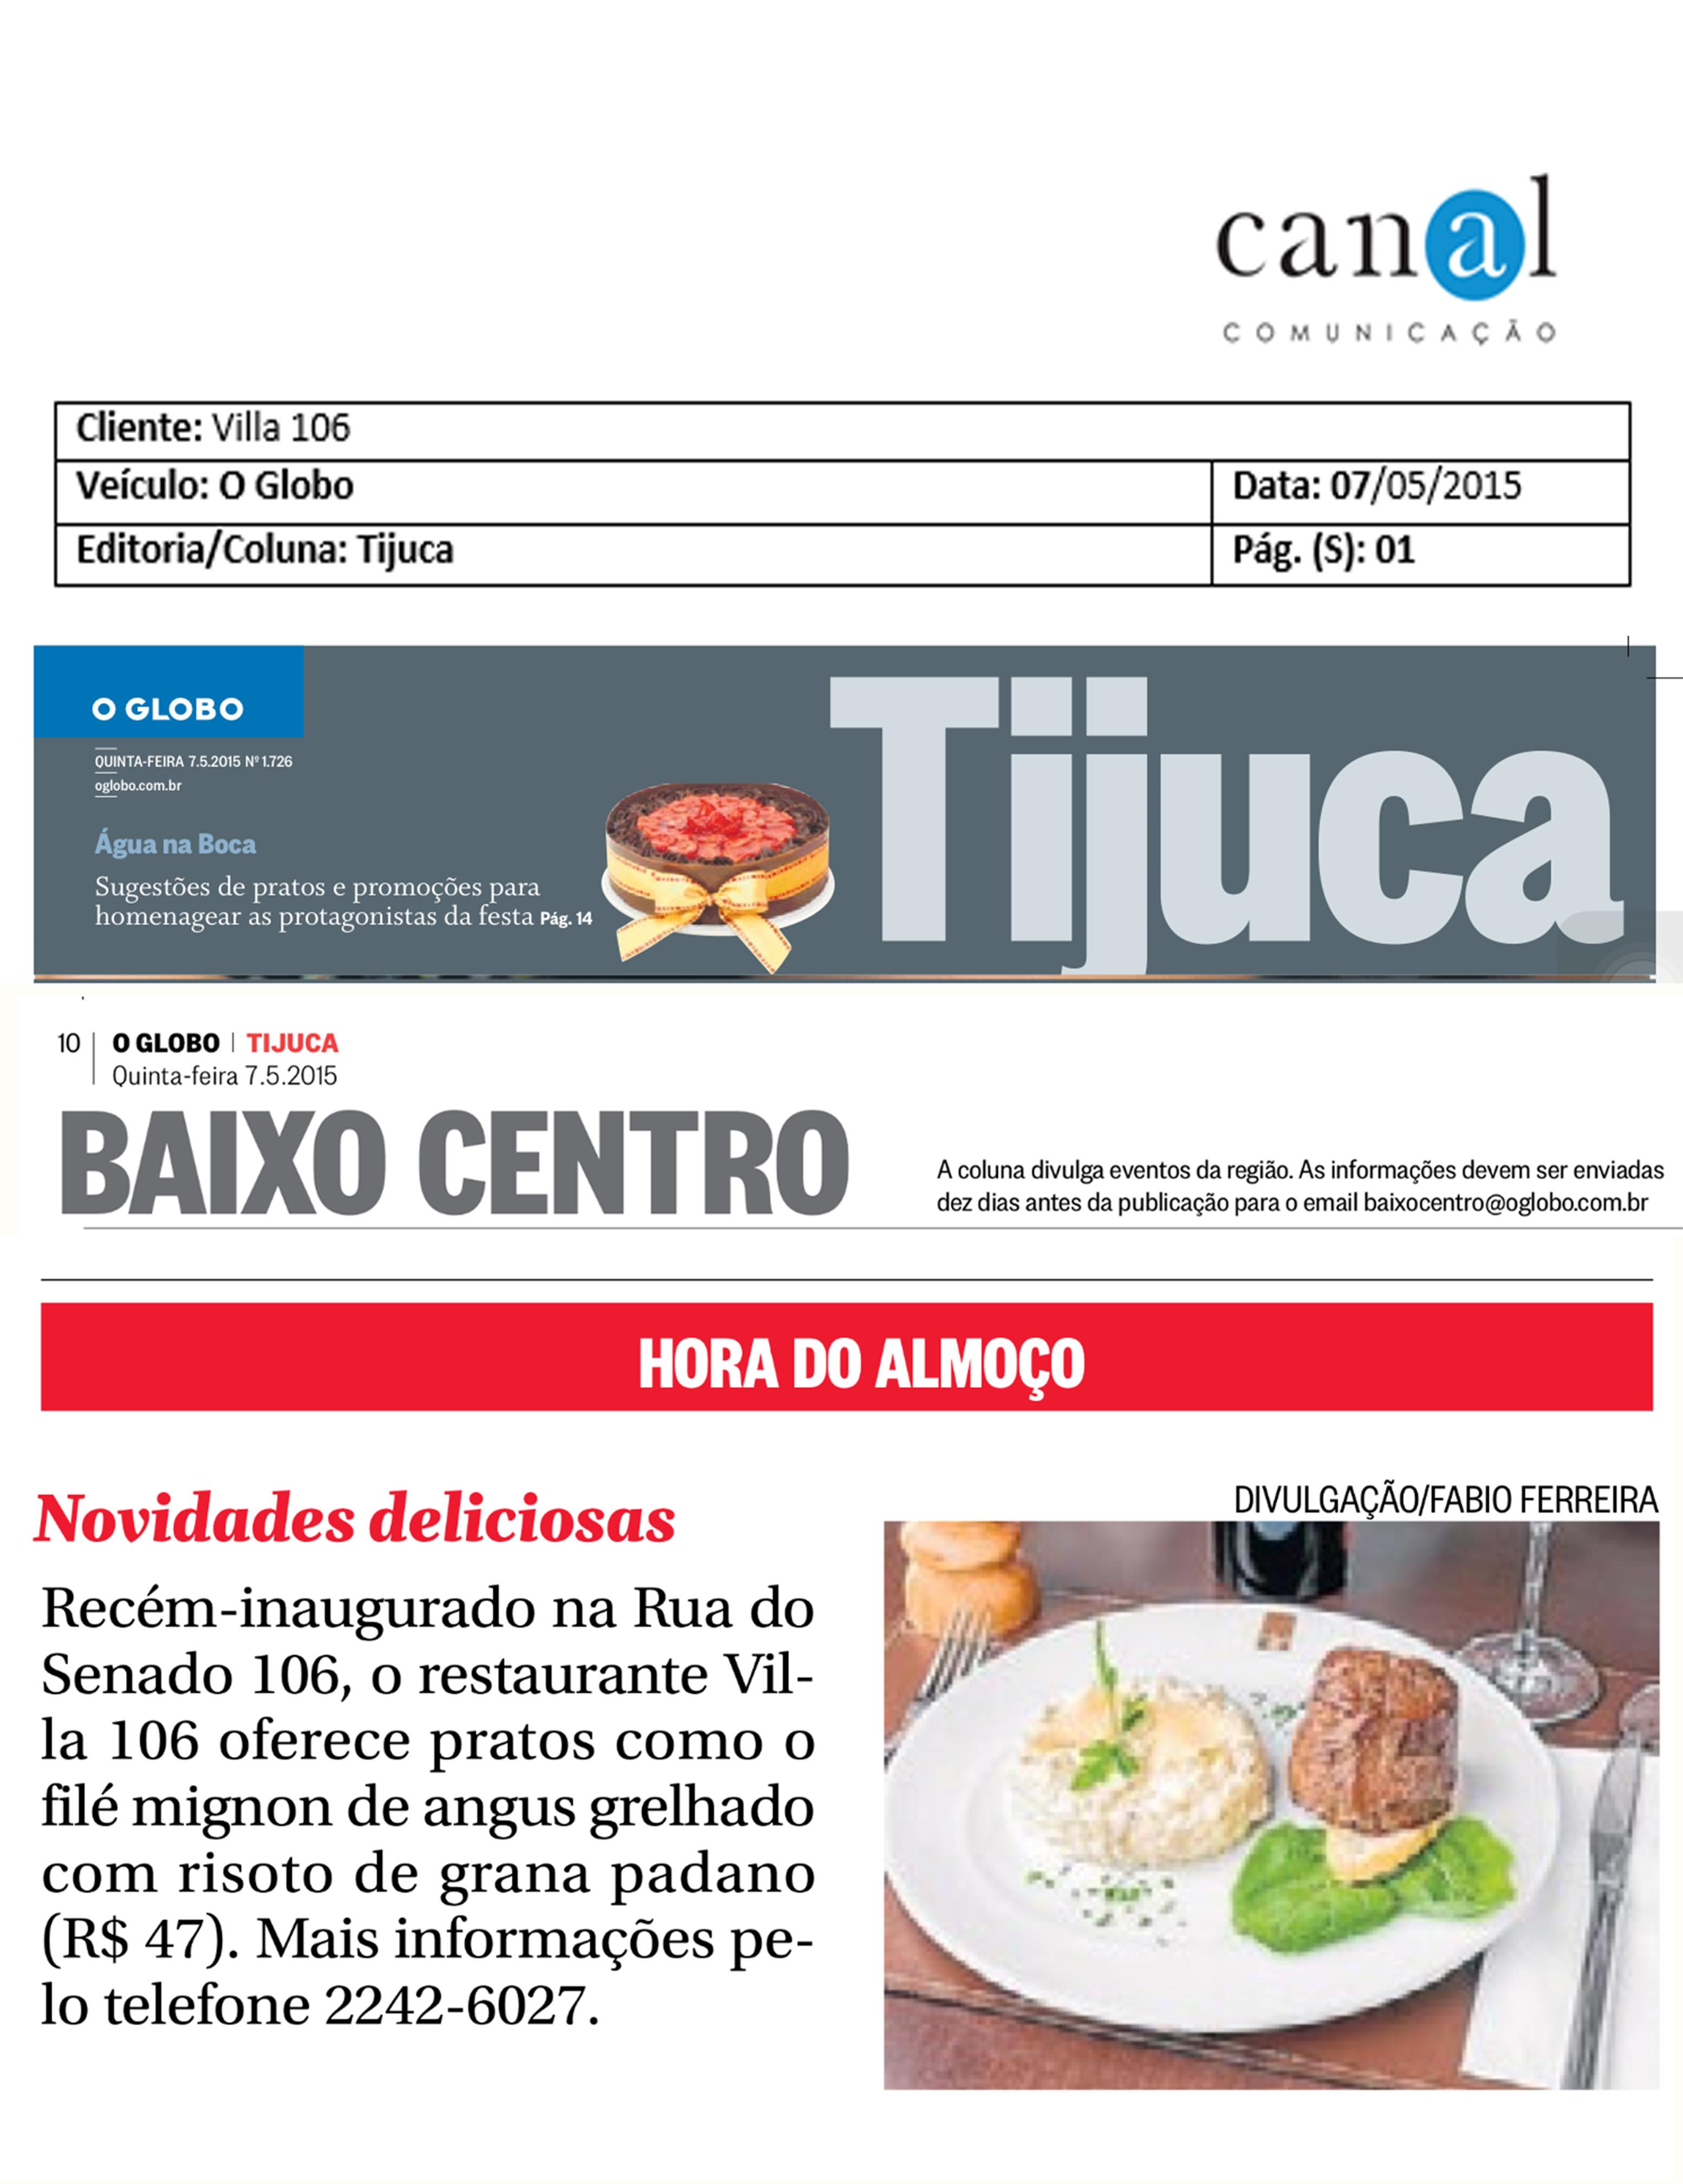 Villa-106_O-Globo_Tijuca_07-05-2015